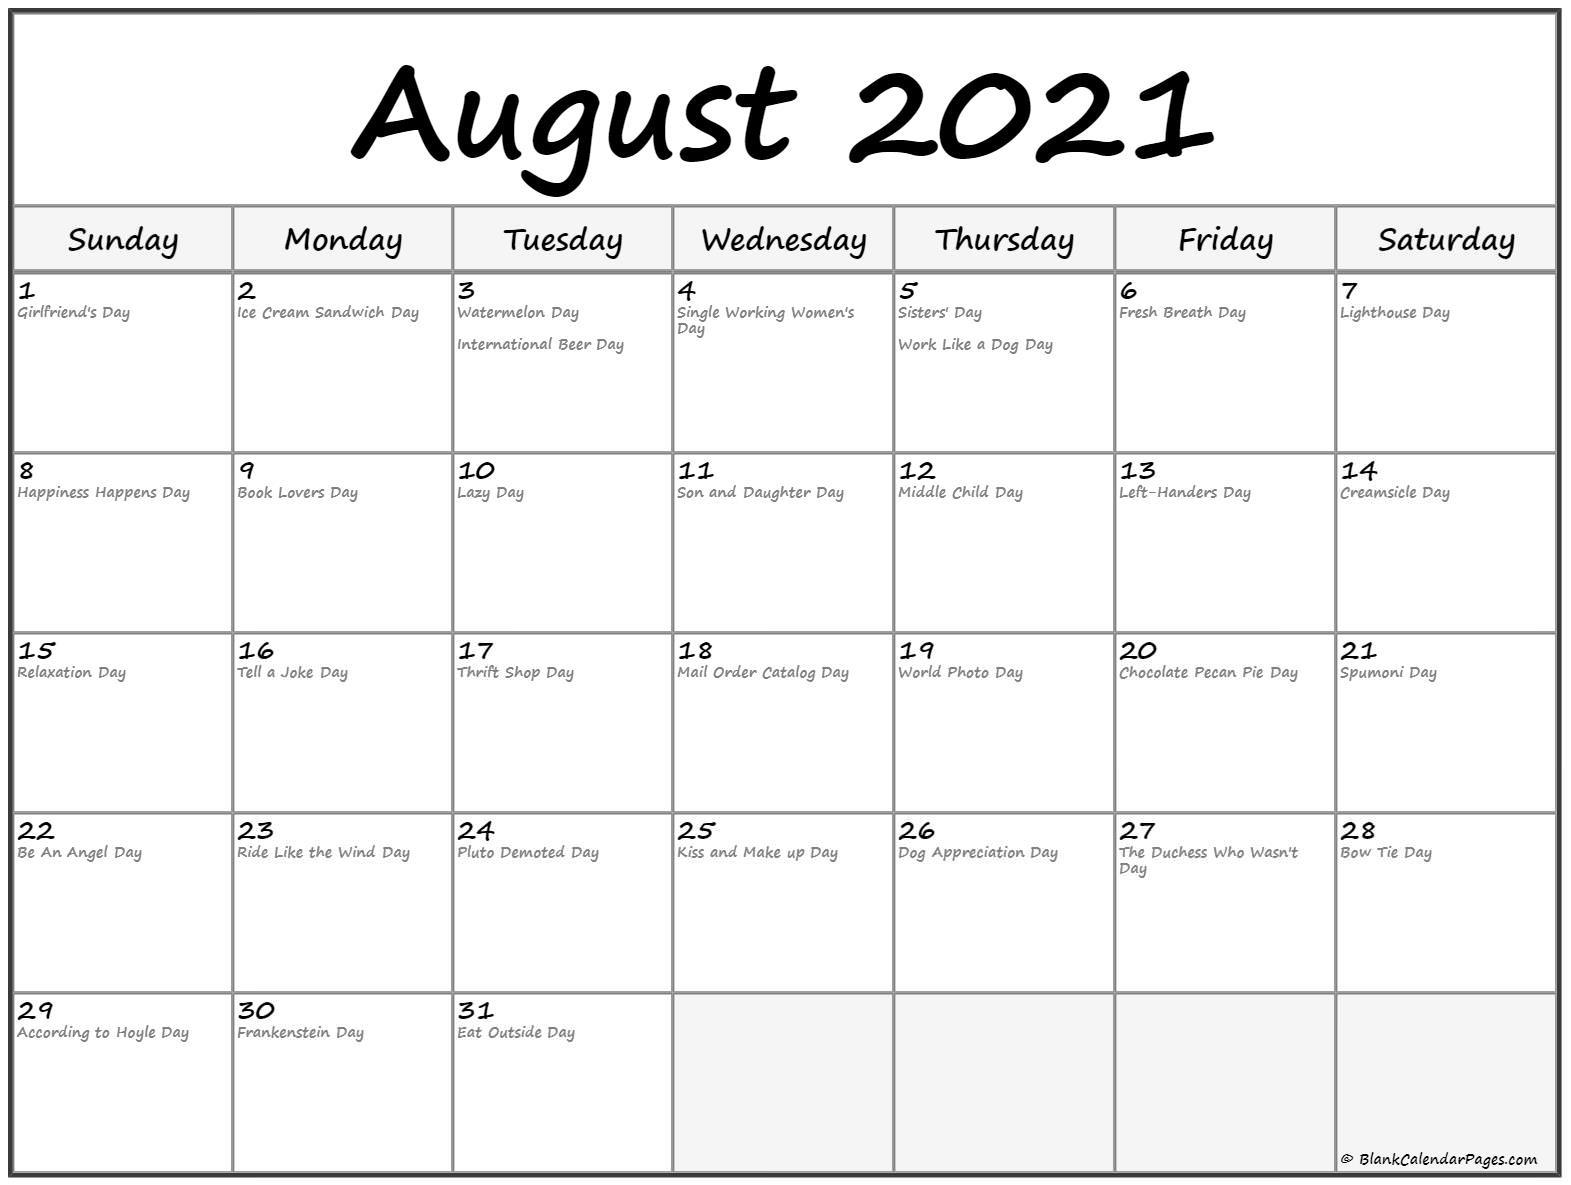 August 2021 Calendar With Holidays August 2021 Calendar Images